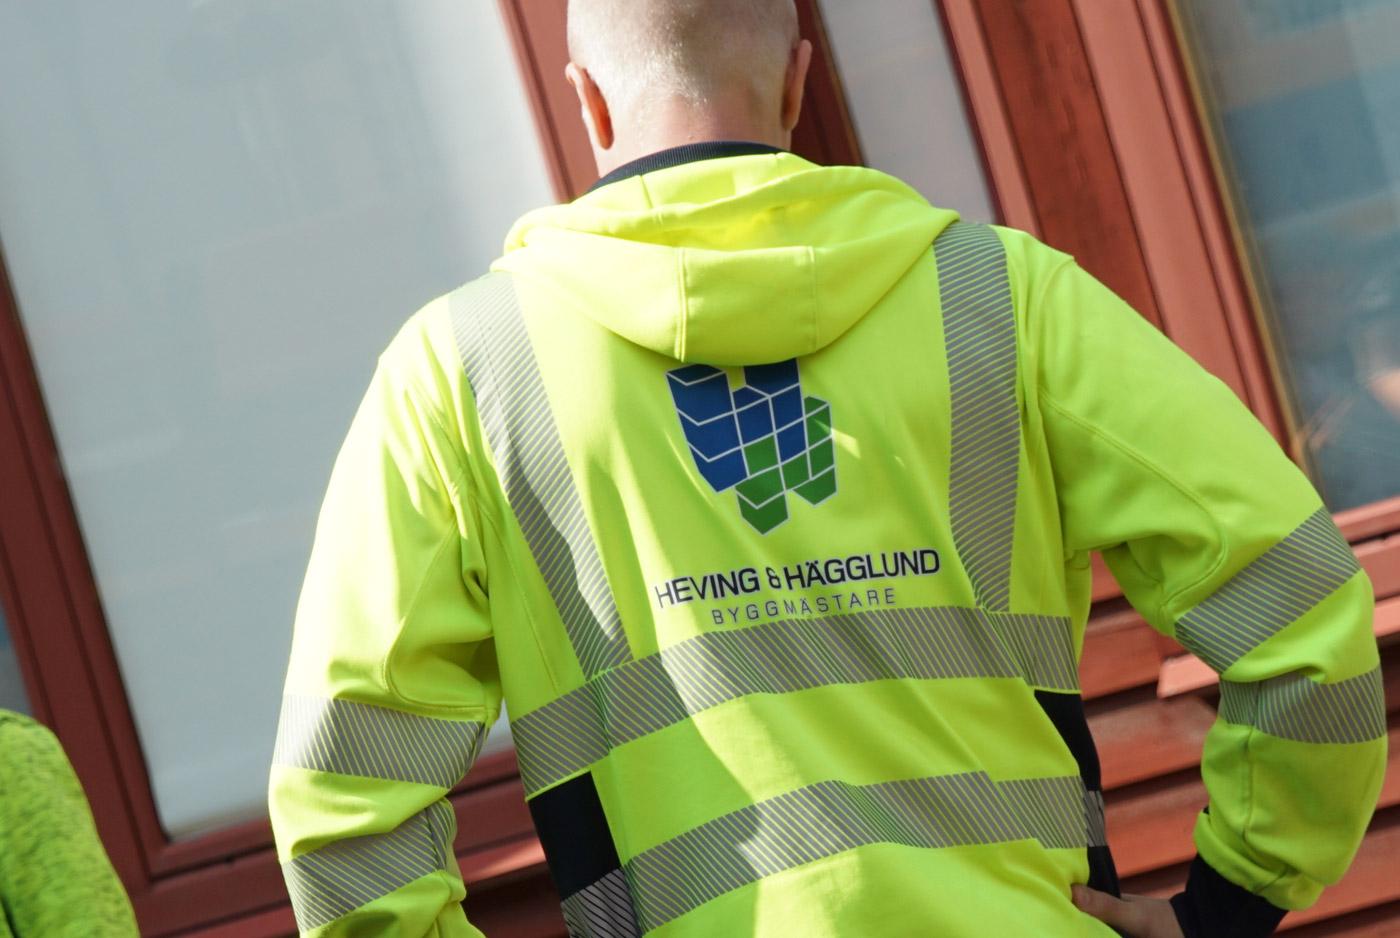 Heving & Hägglund - Hållbarhet - Personal